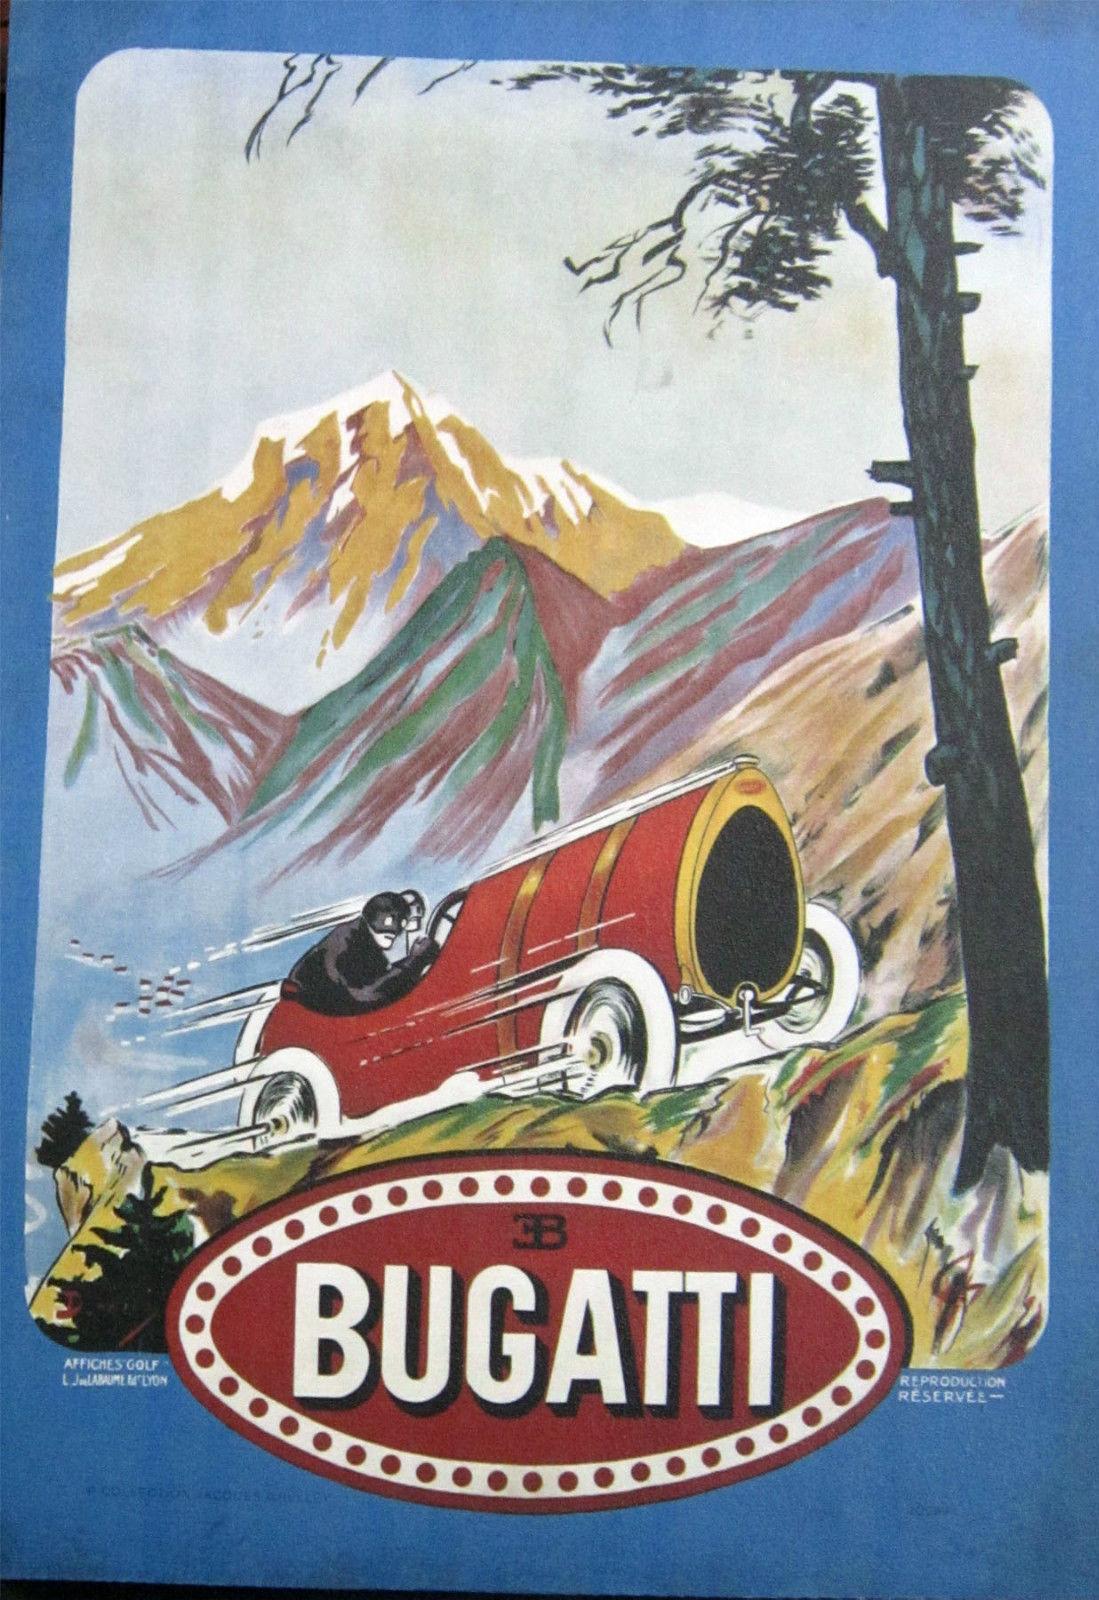 Vintage Automobilia Bugatti Racing Canvas Images (Video)